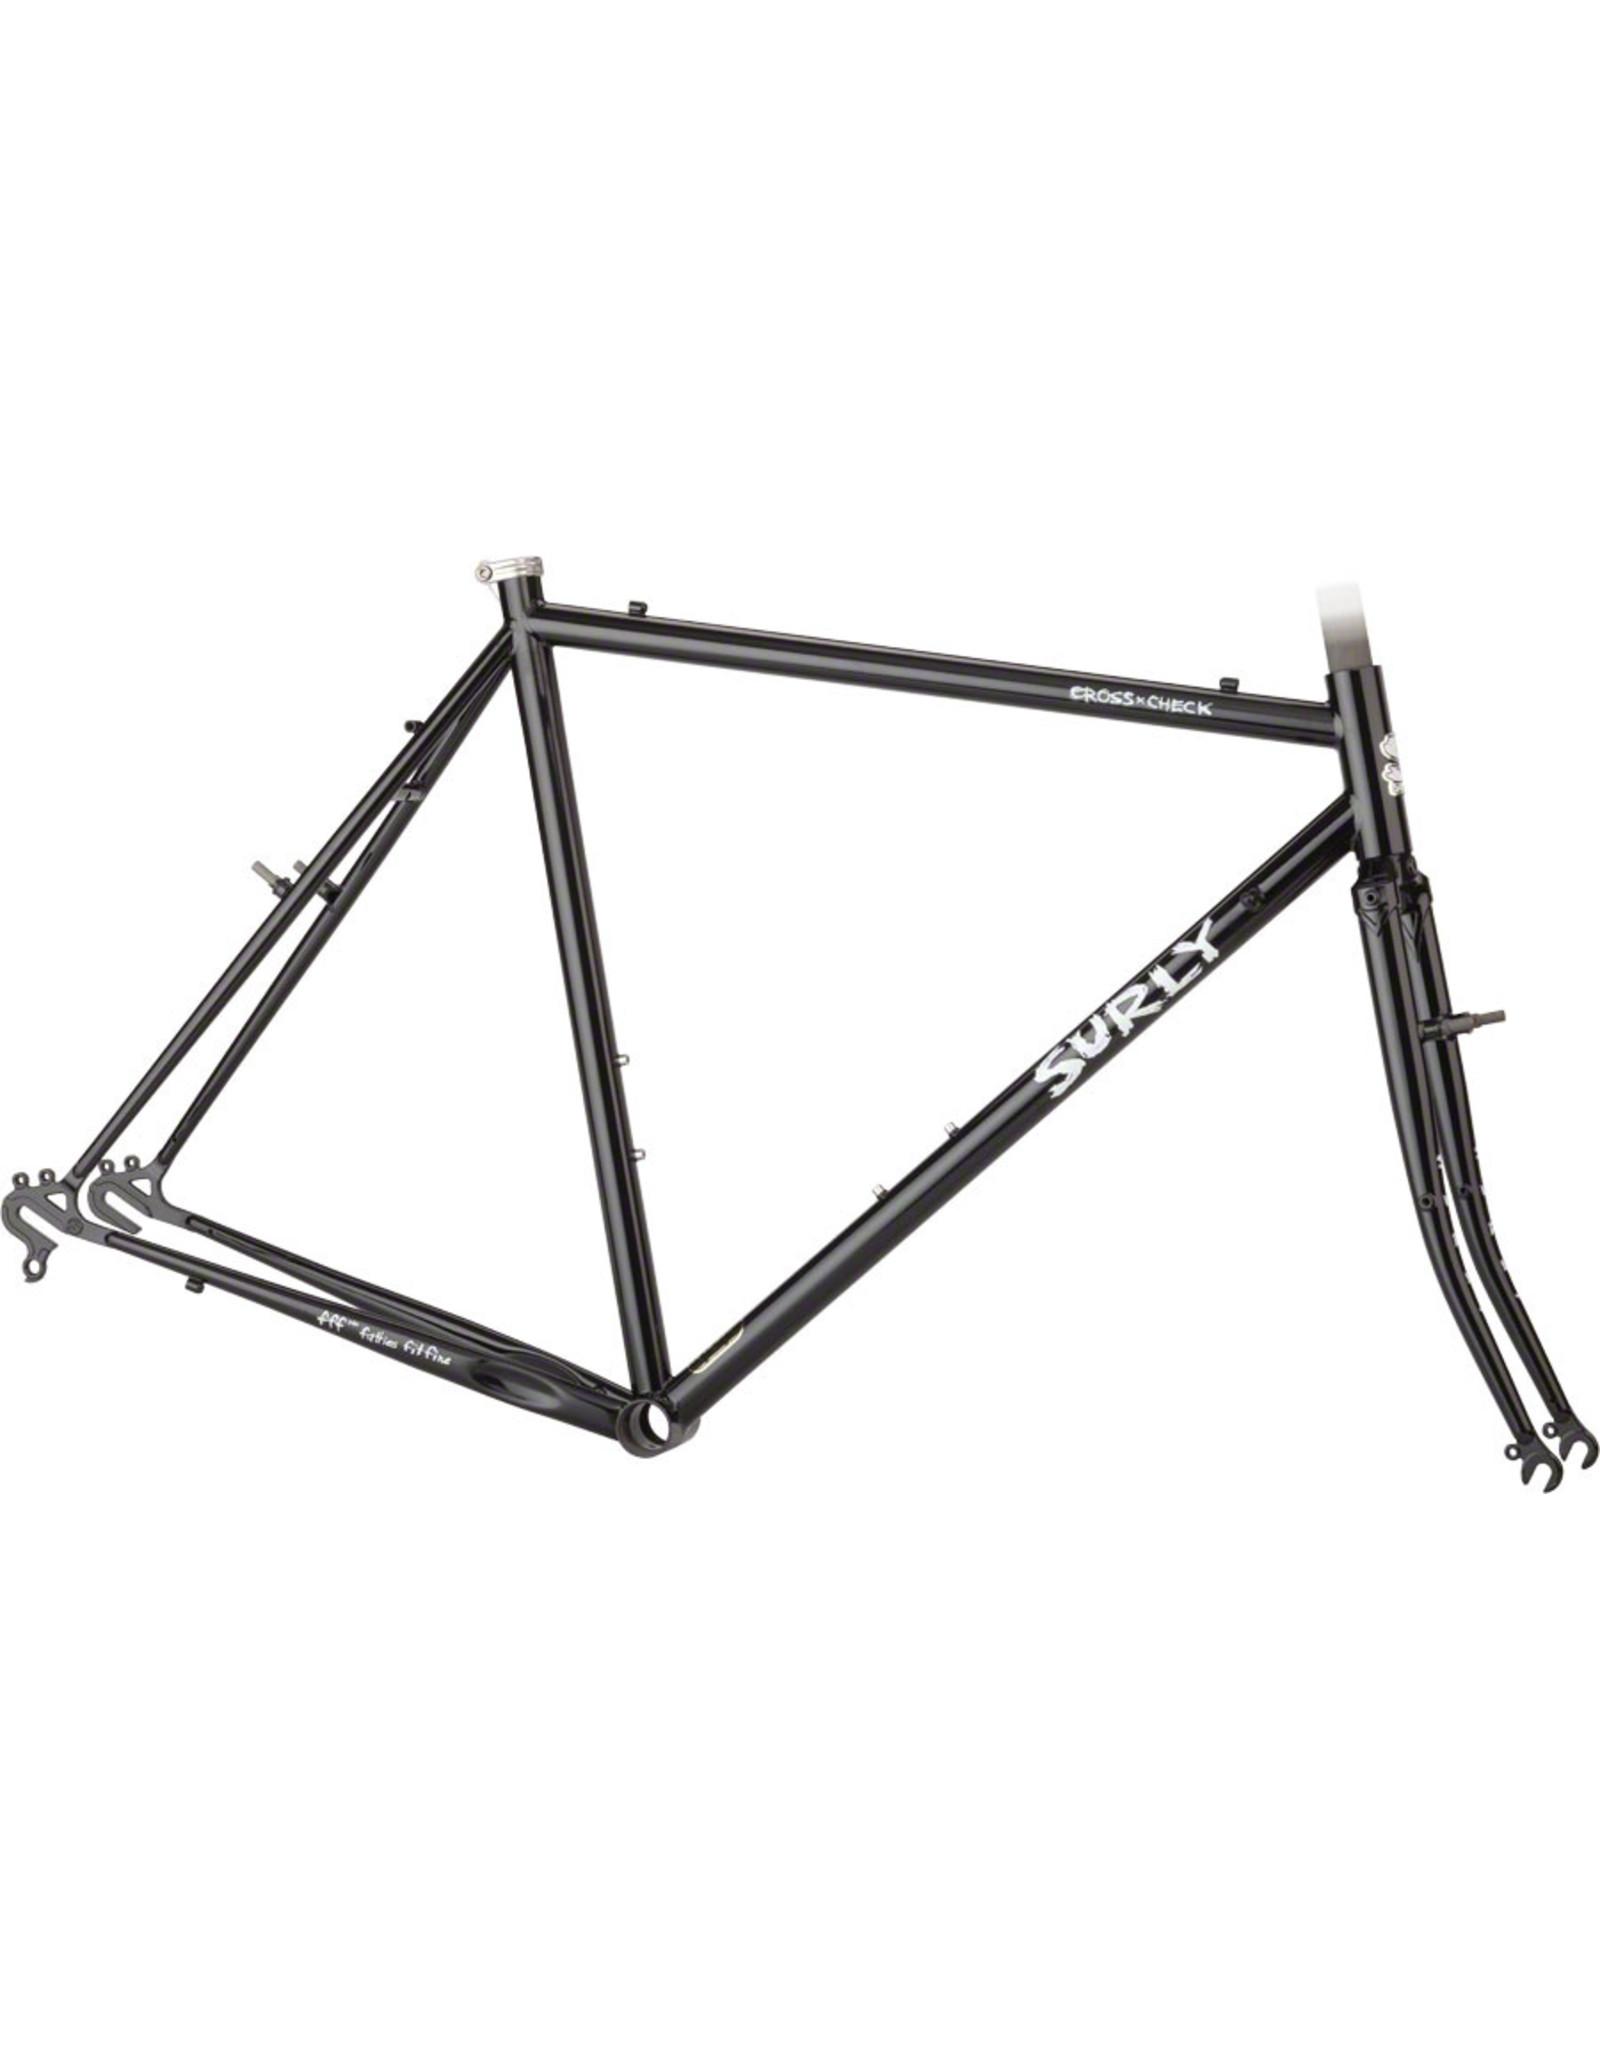 Surly Surly Cross Check Frameset - Steel